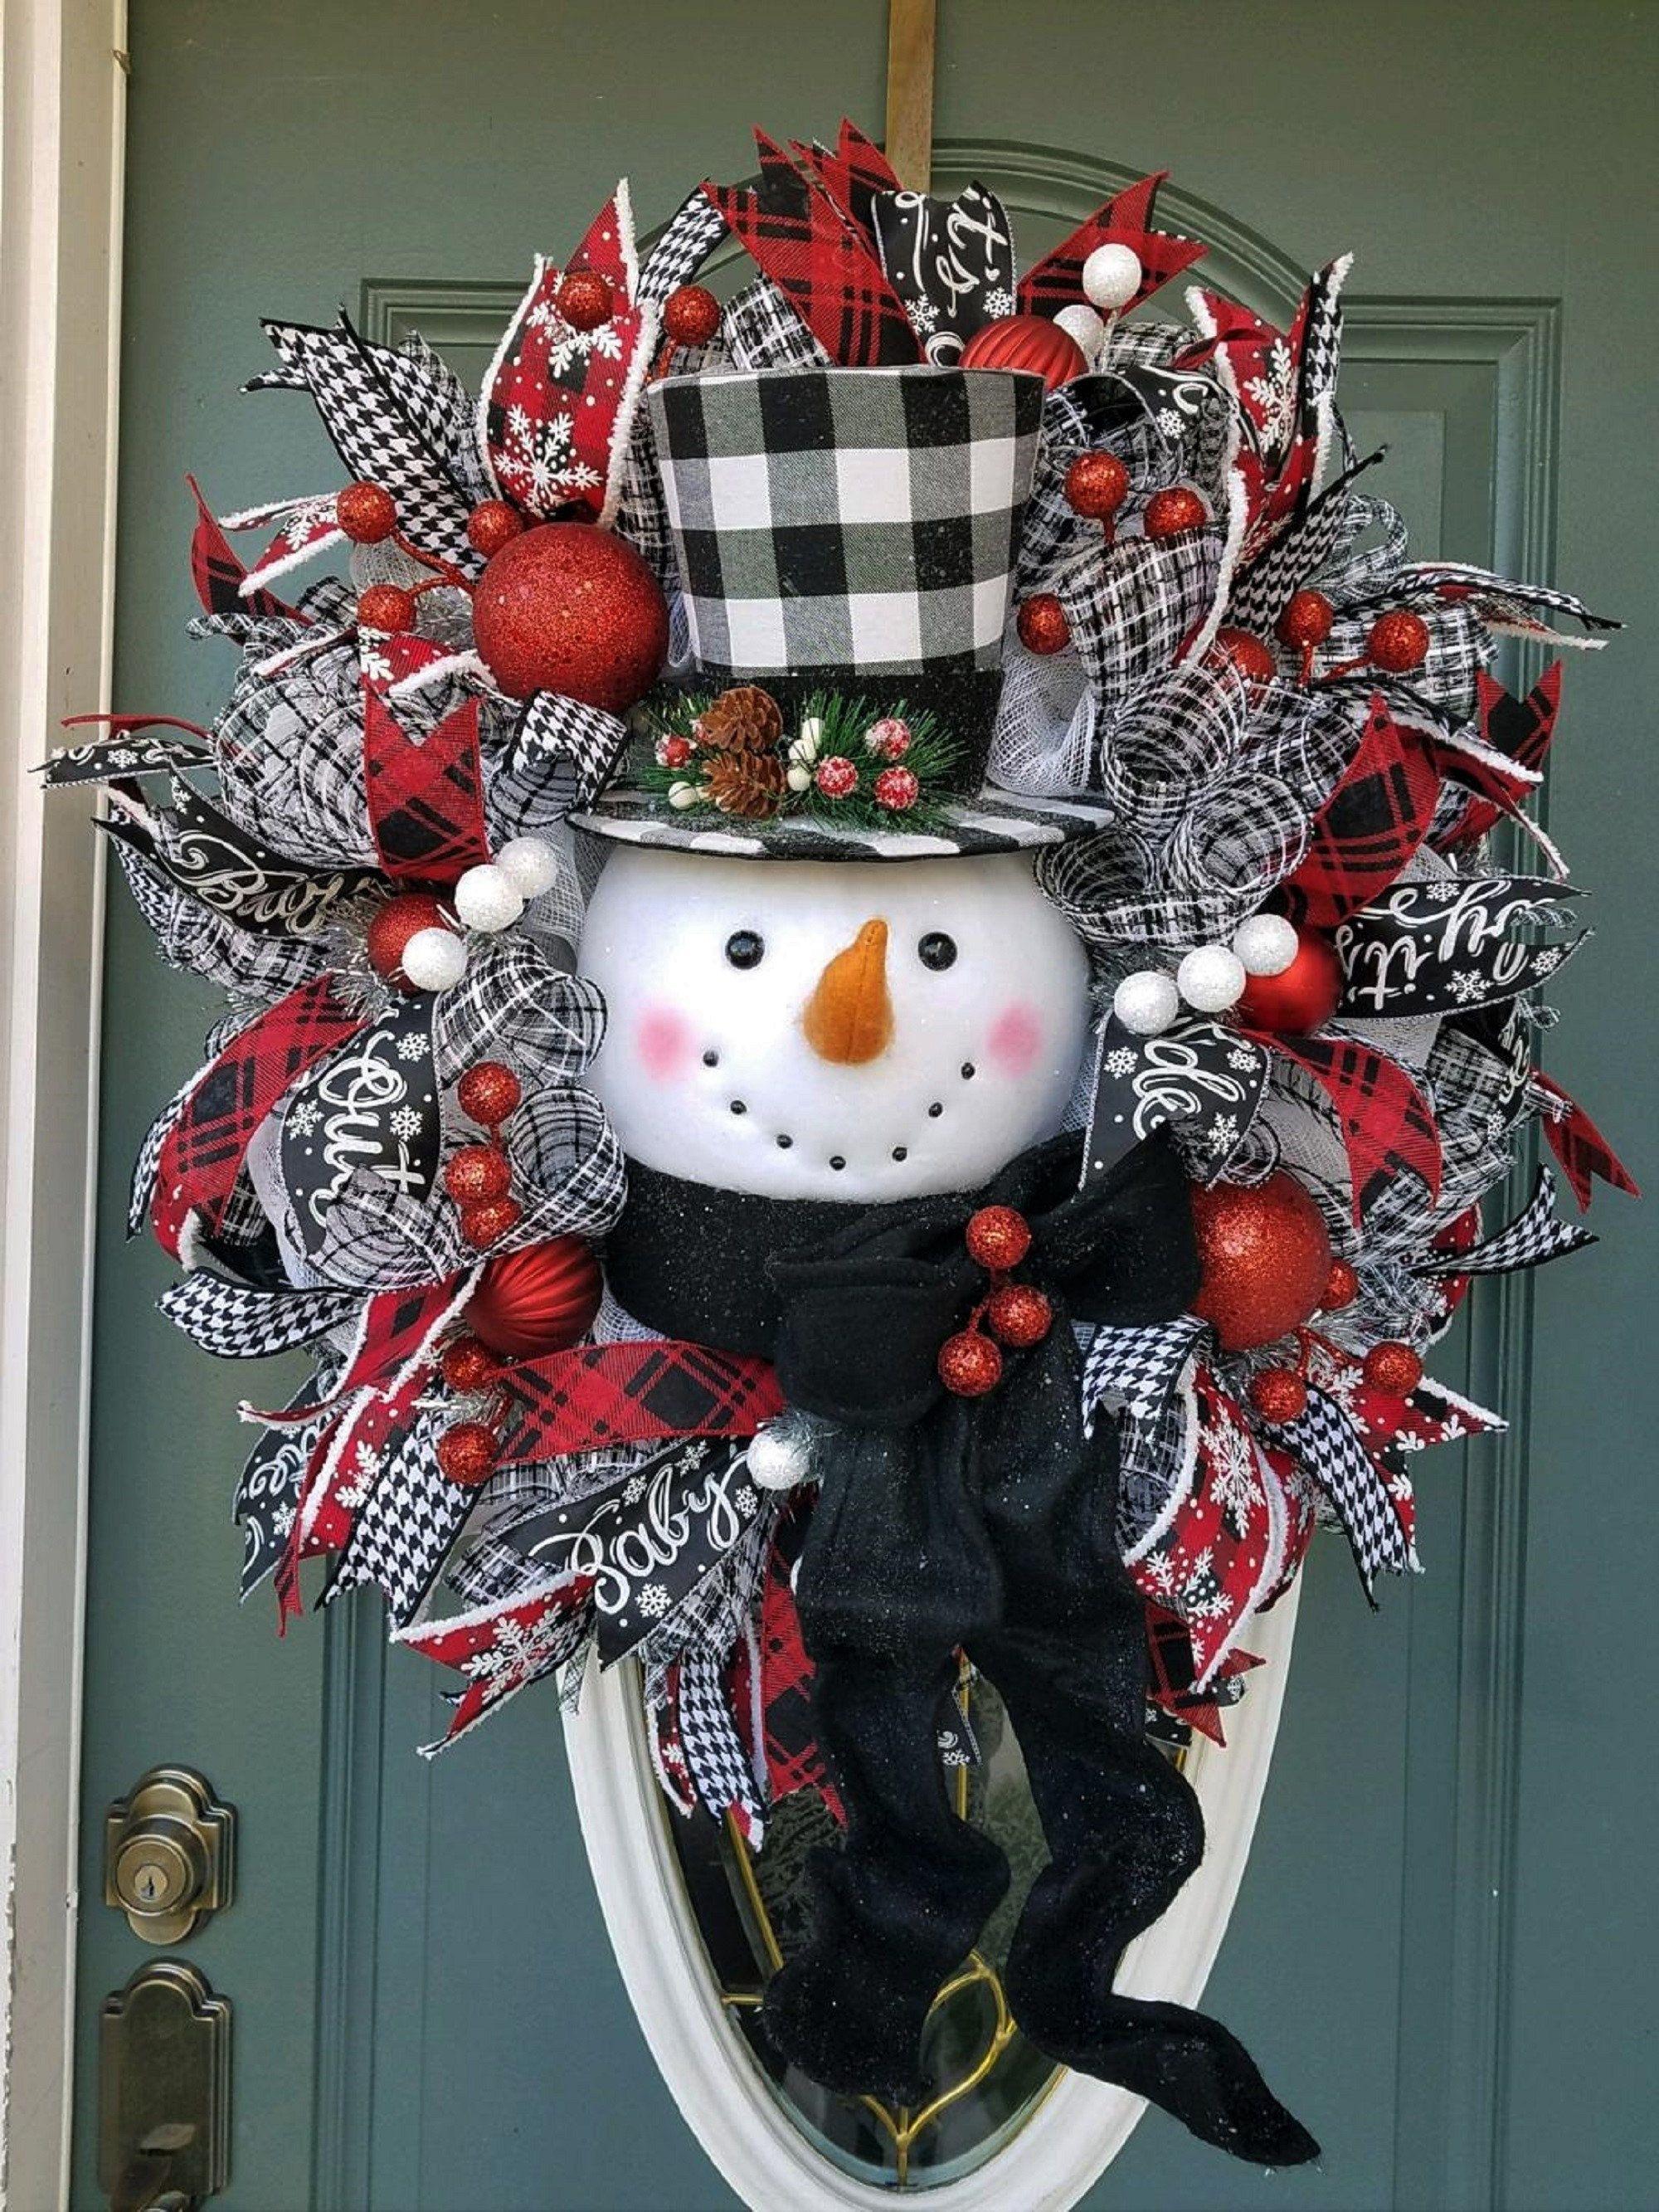 Christmas Wreath Snowman Wreath For Front Door Traditional Christmas Wreath Buffalo Plaid Christ Large Christmas Wreath Christmas Wreaths Christmas Swags